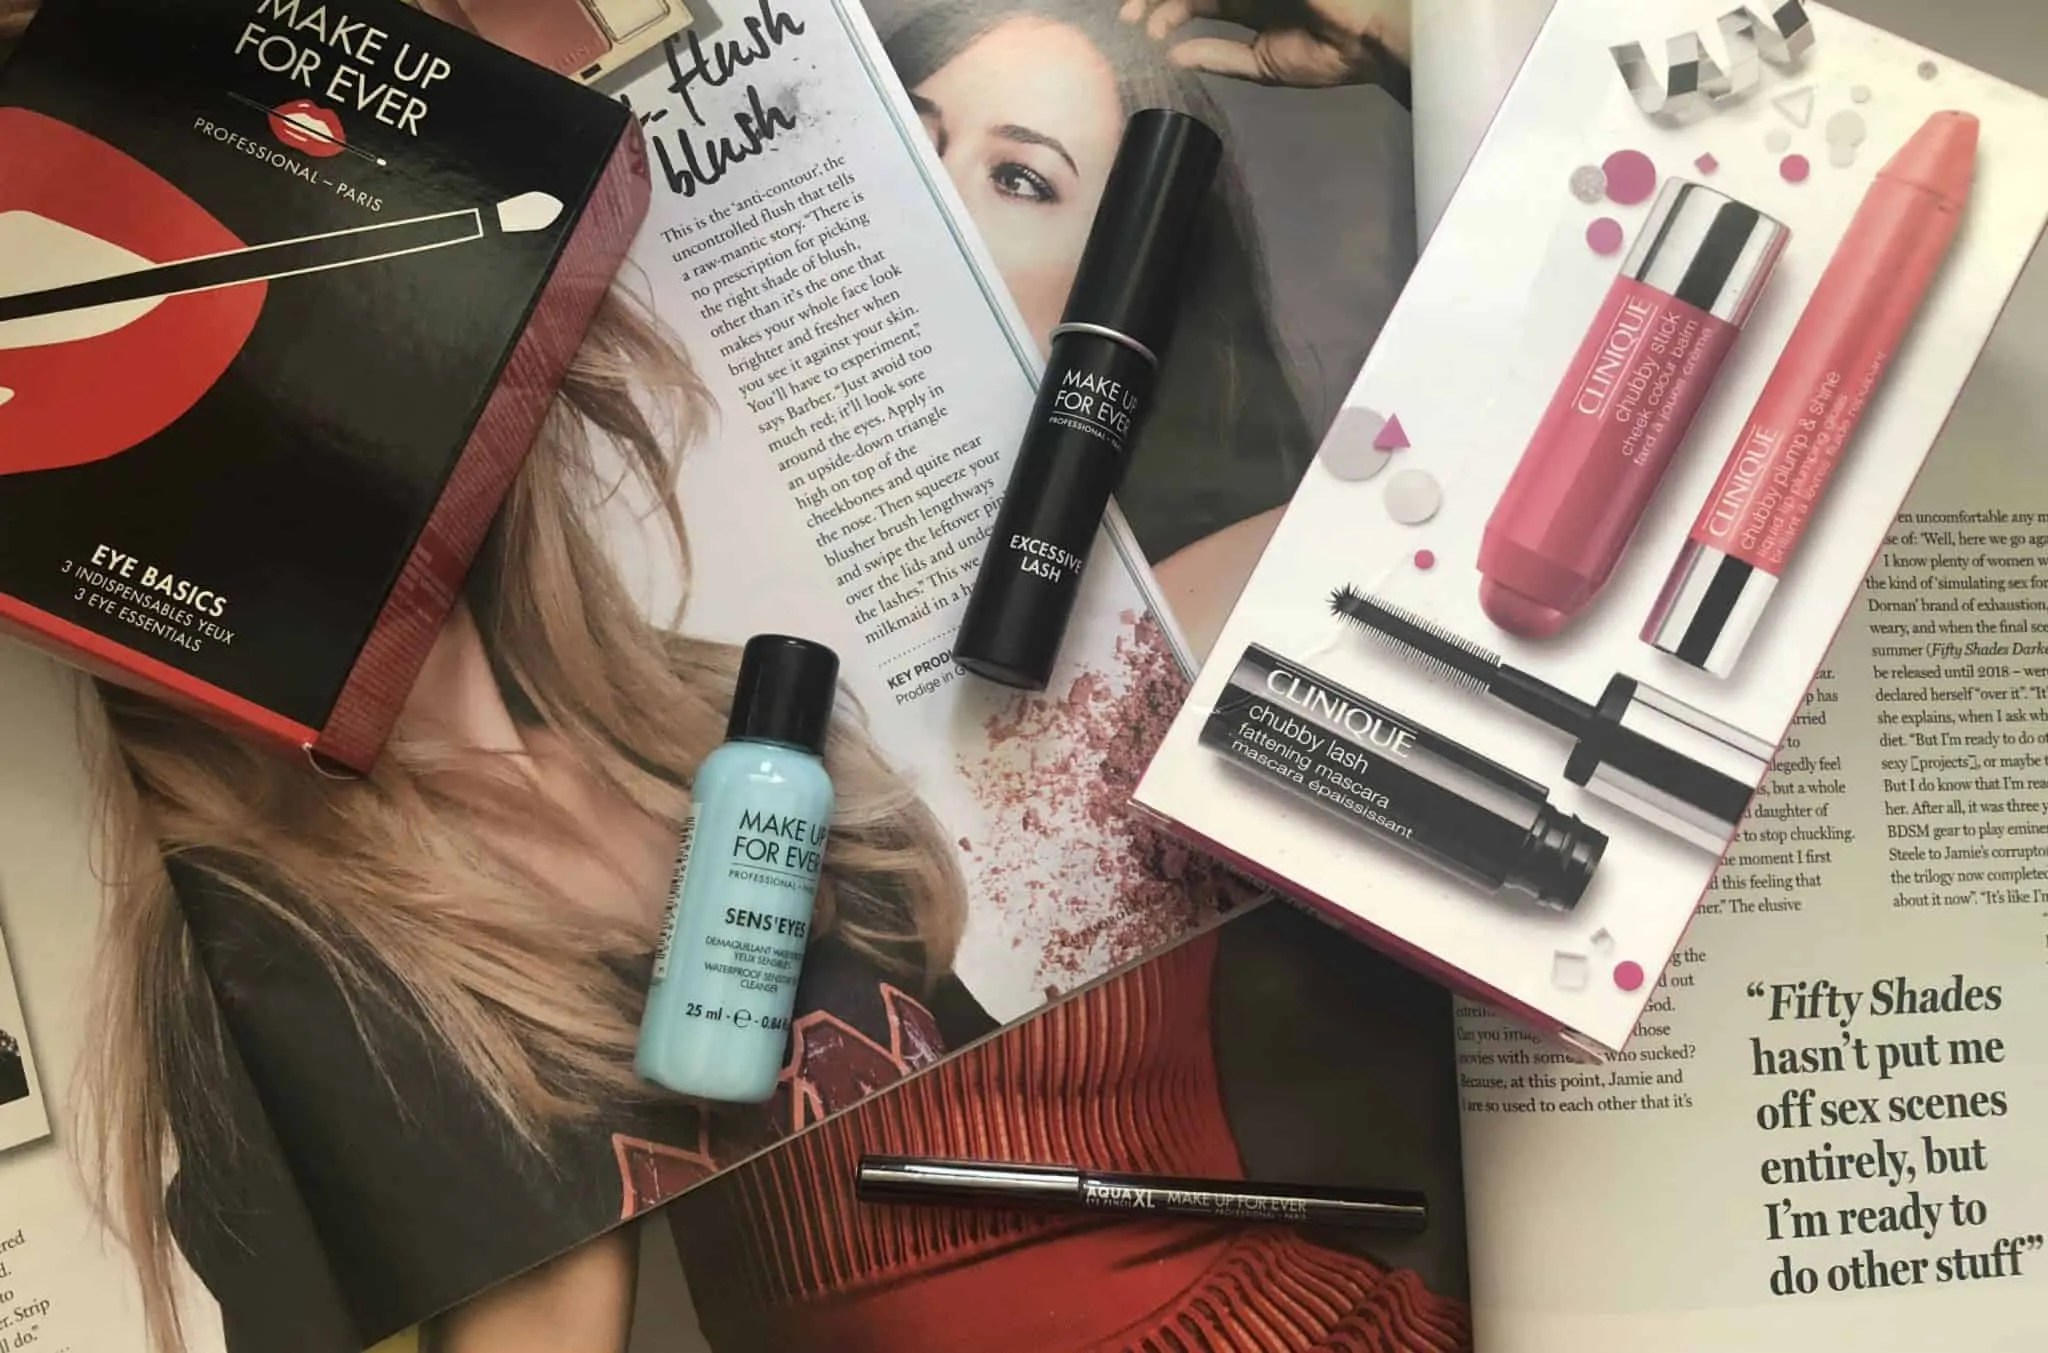 Win a fabulous Makeup Forever and Clinique makeup set